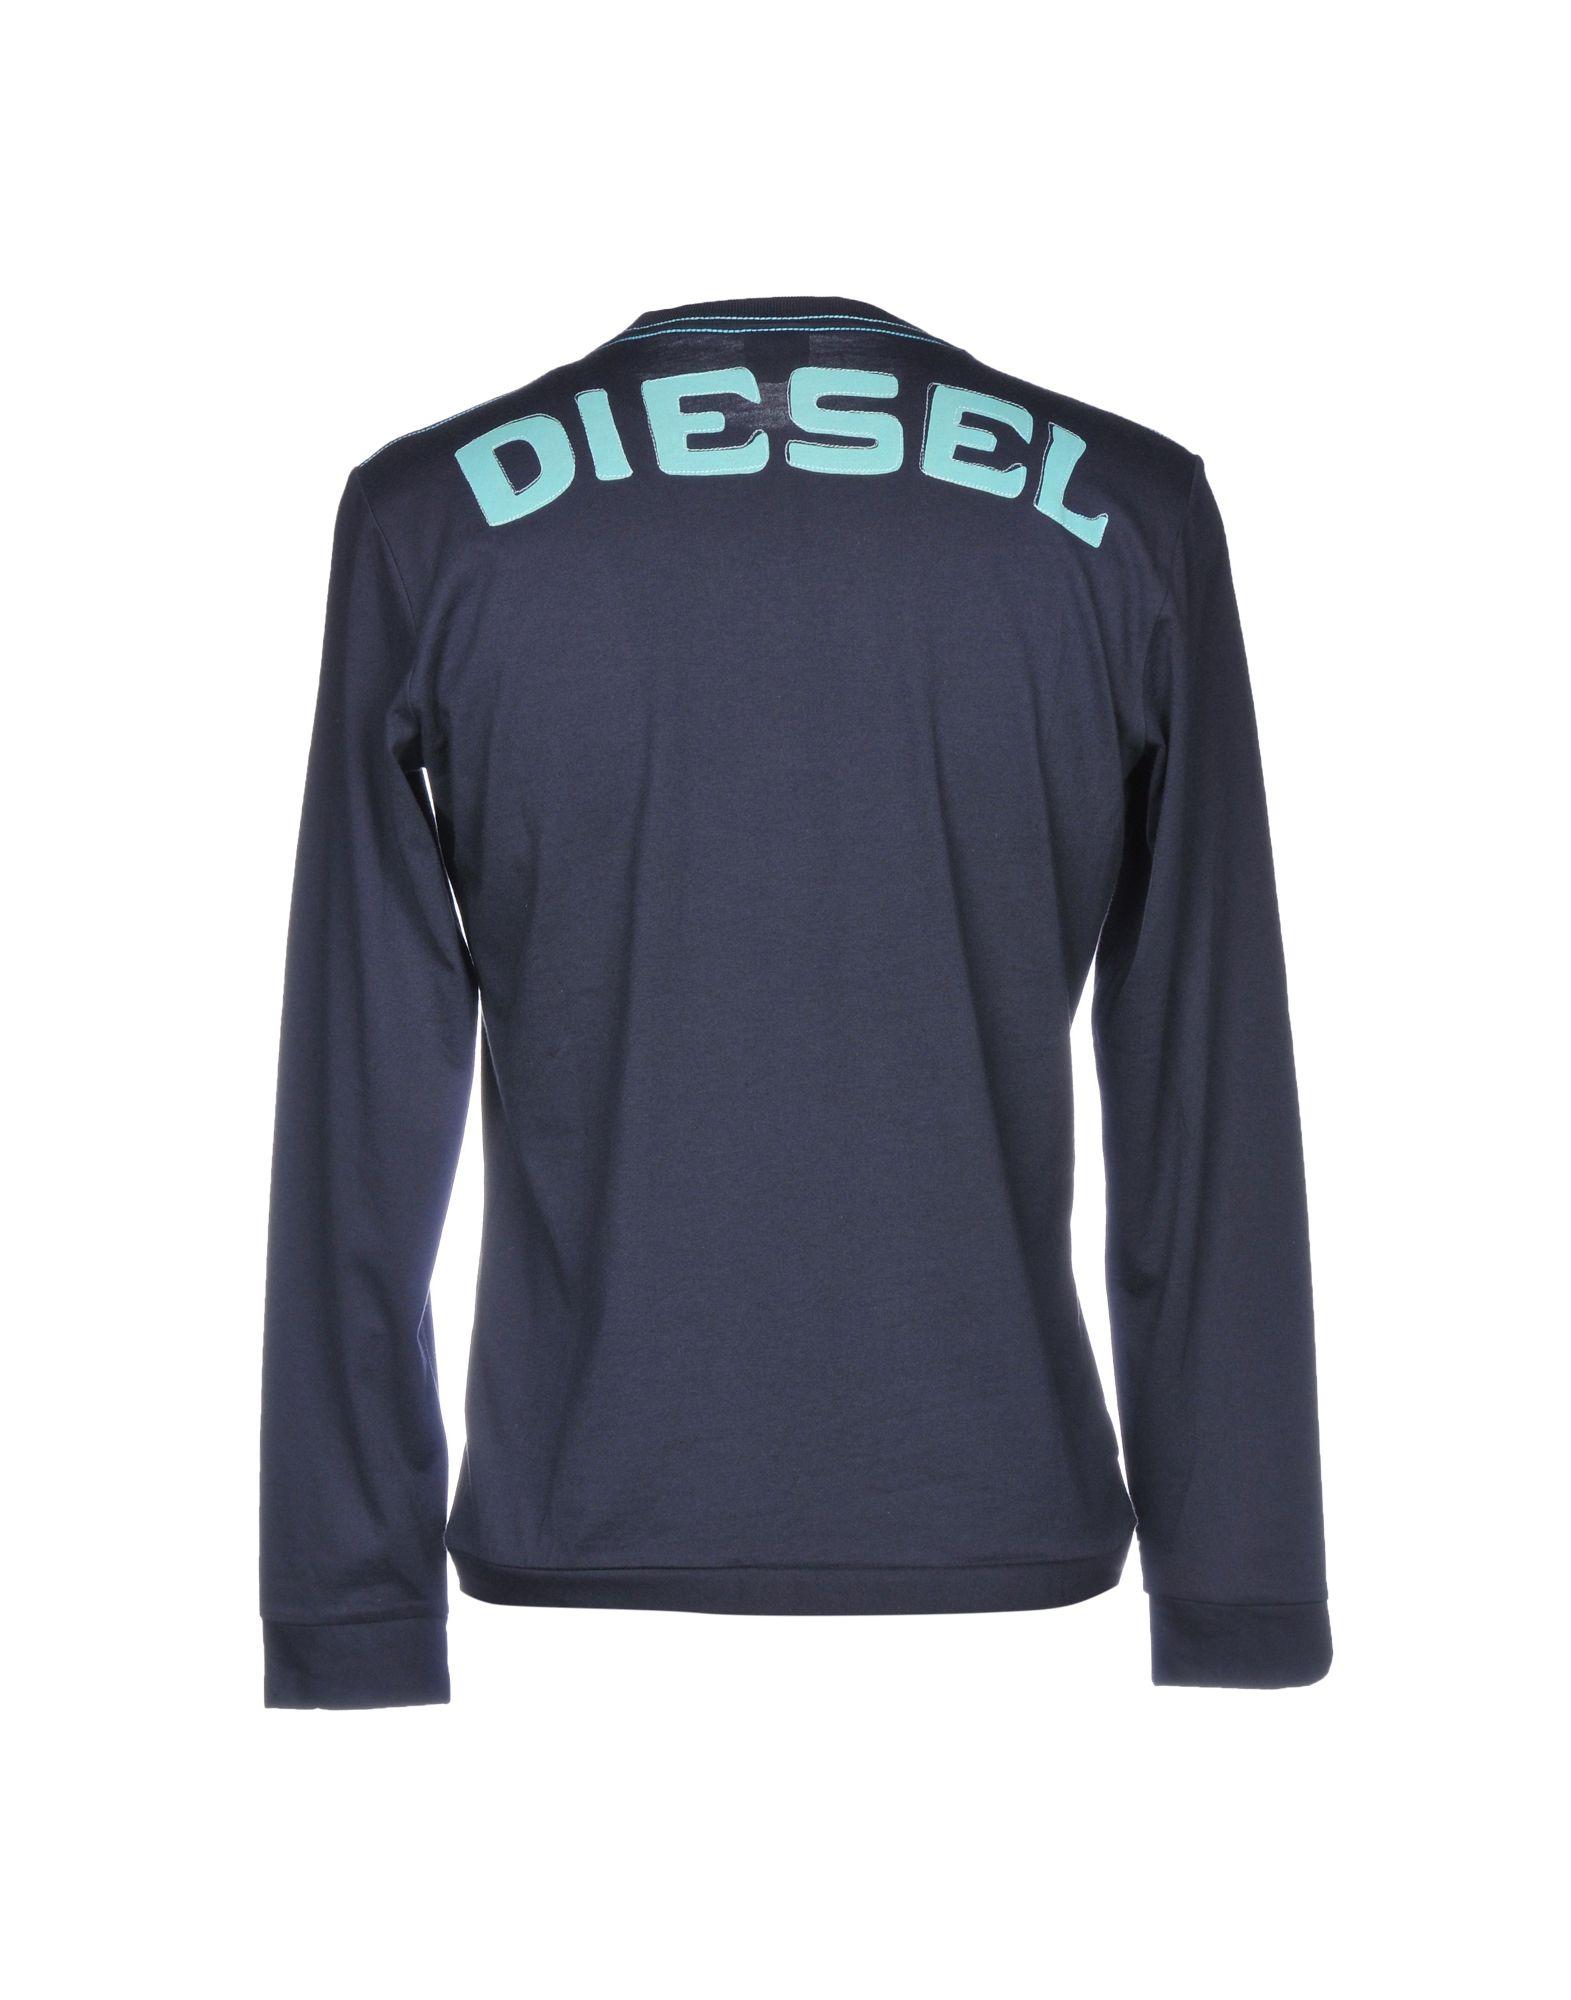 A buon mercato A buon mercato mercato buon T-Shirt Diesel Uomo - 12206674EQ 2c6455